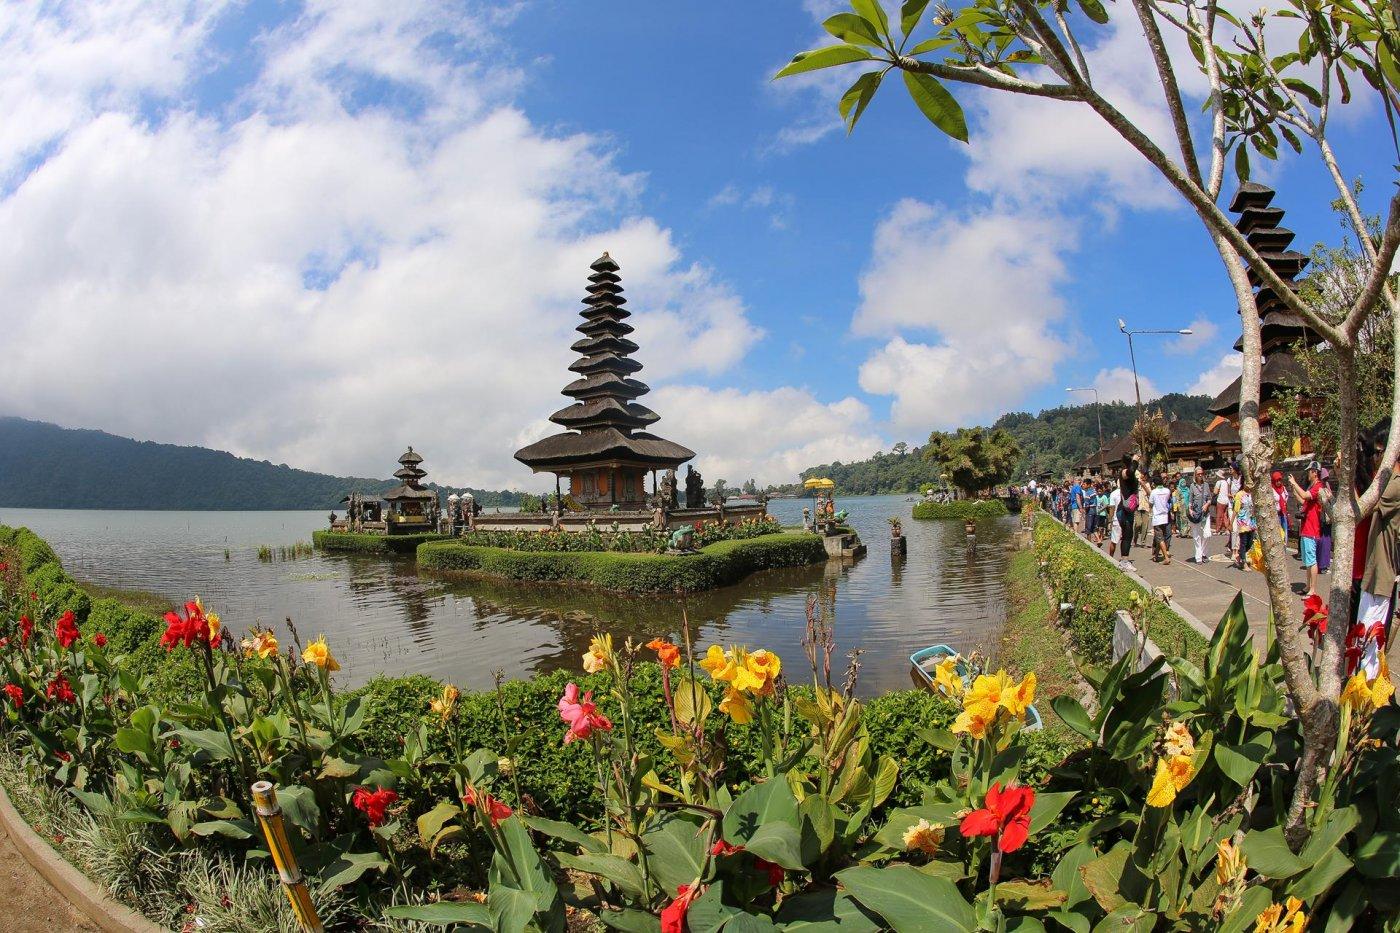 Фото 20150623_459.jpg. Индонезия, Bali, Jalan Raya Candi Kuning-Bedugul